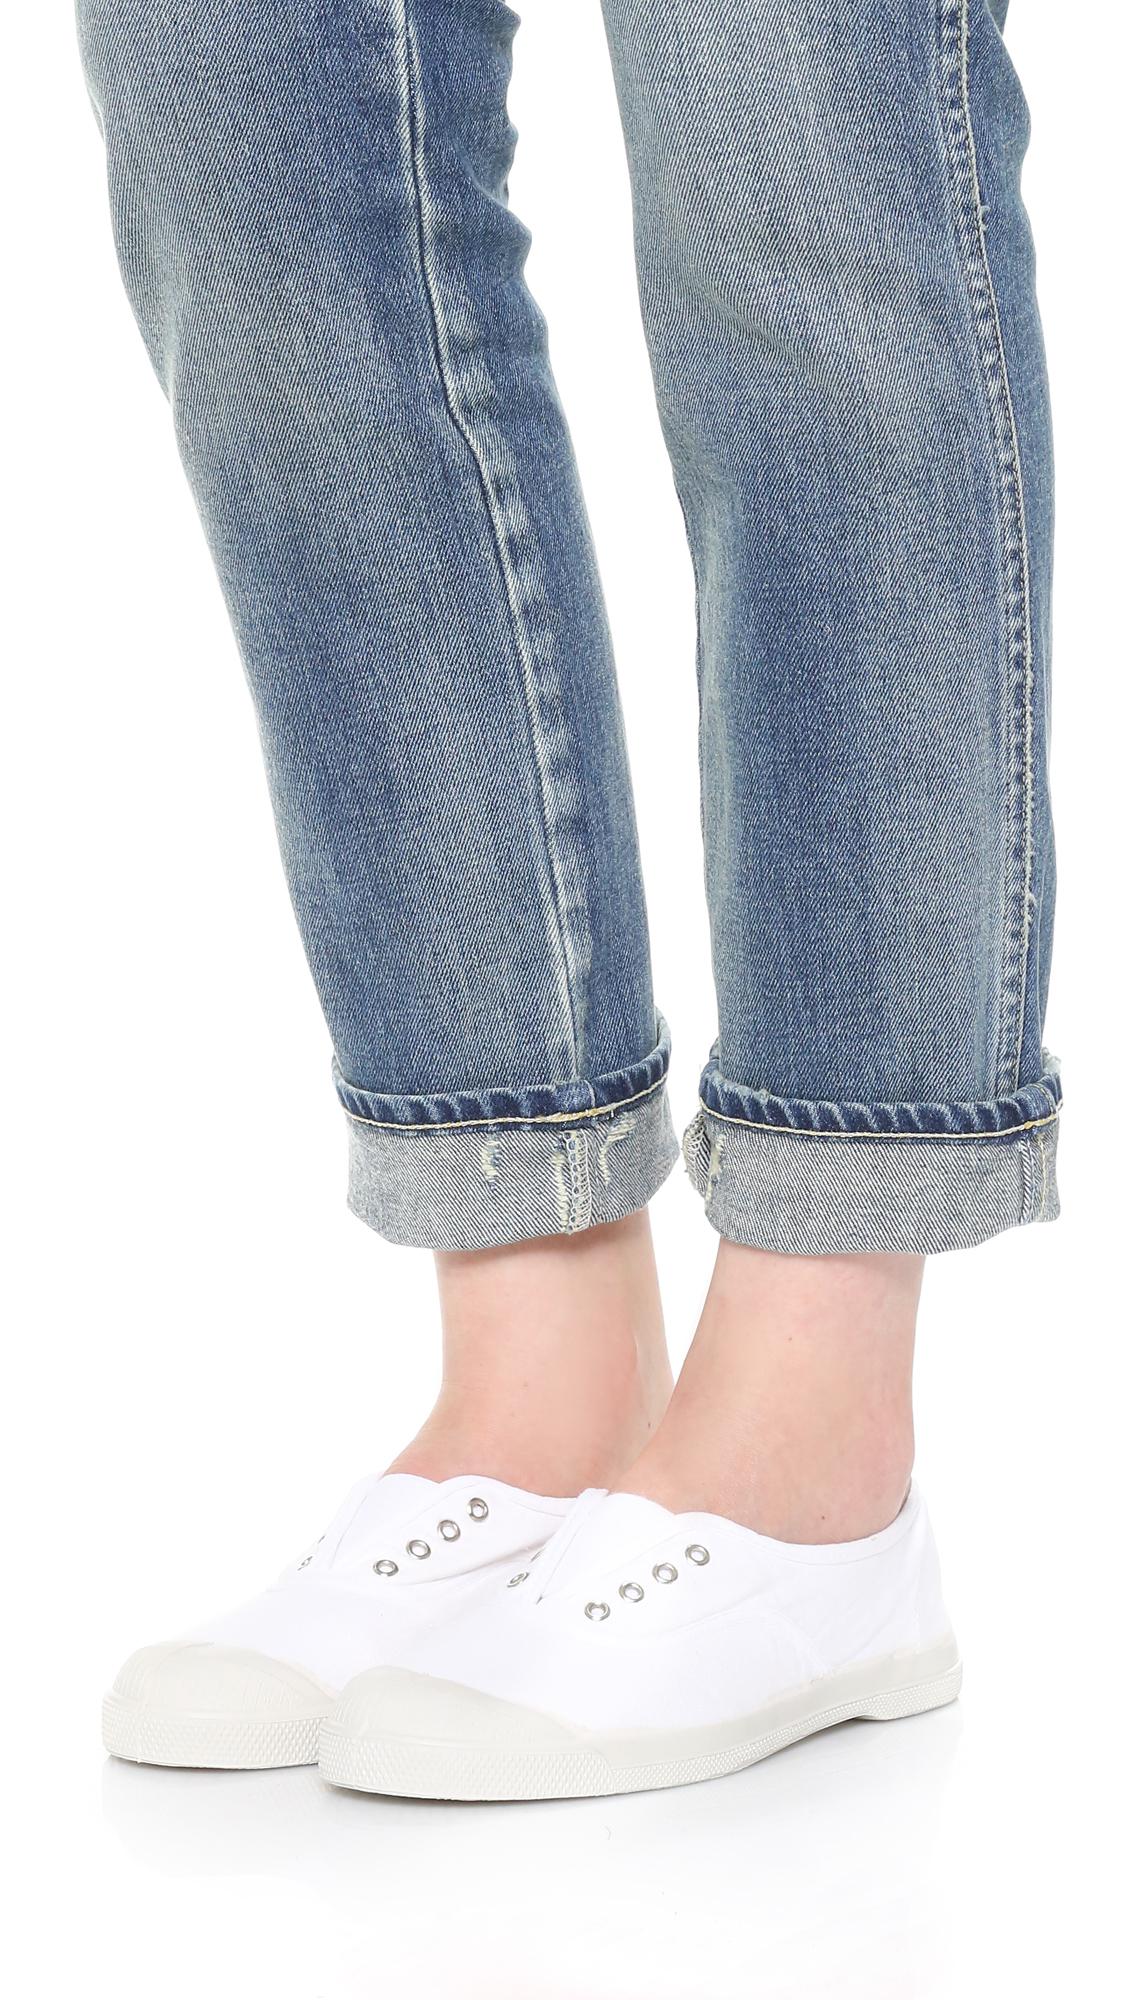 Bensimon Chaussures TENNIS ELLY Vente Pas Cher Pour Pas Cher Prix Pas Cher À Bas Prix Acheter Discount Promotion boutique vraiment RaavgePPJ